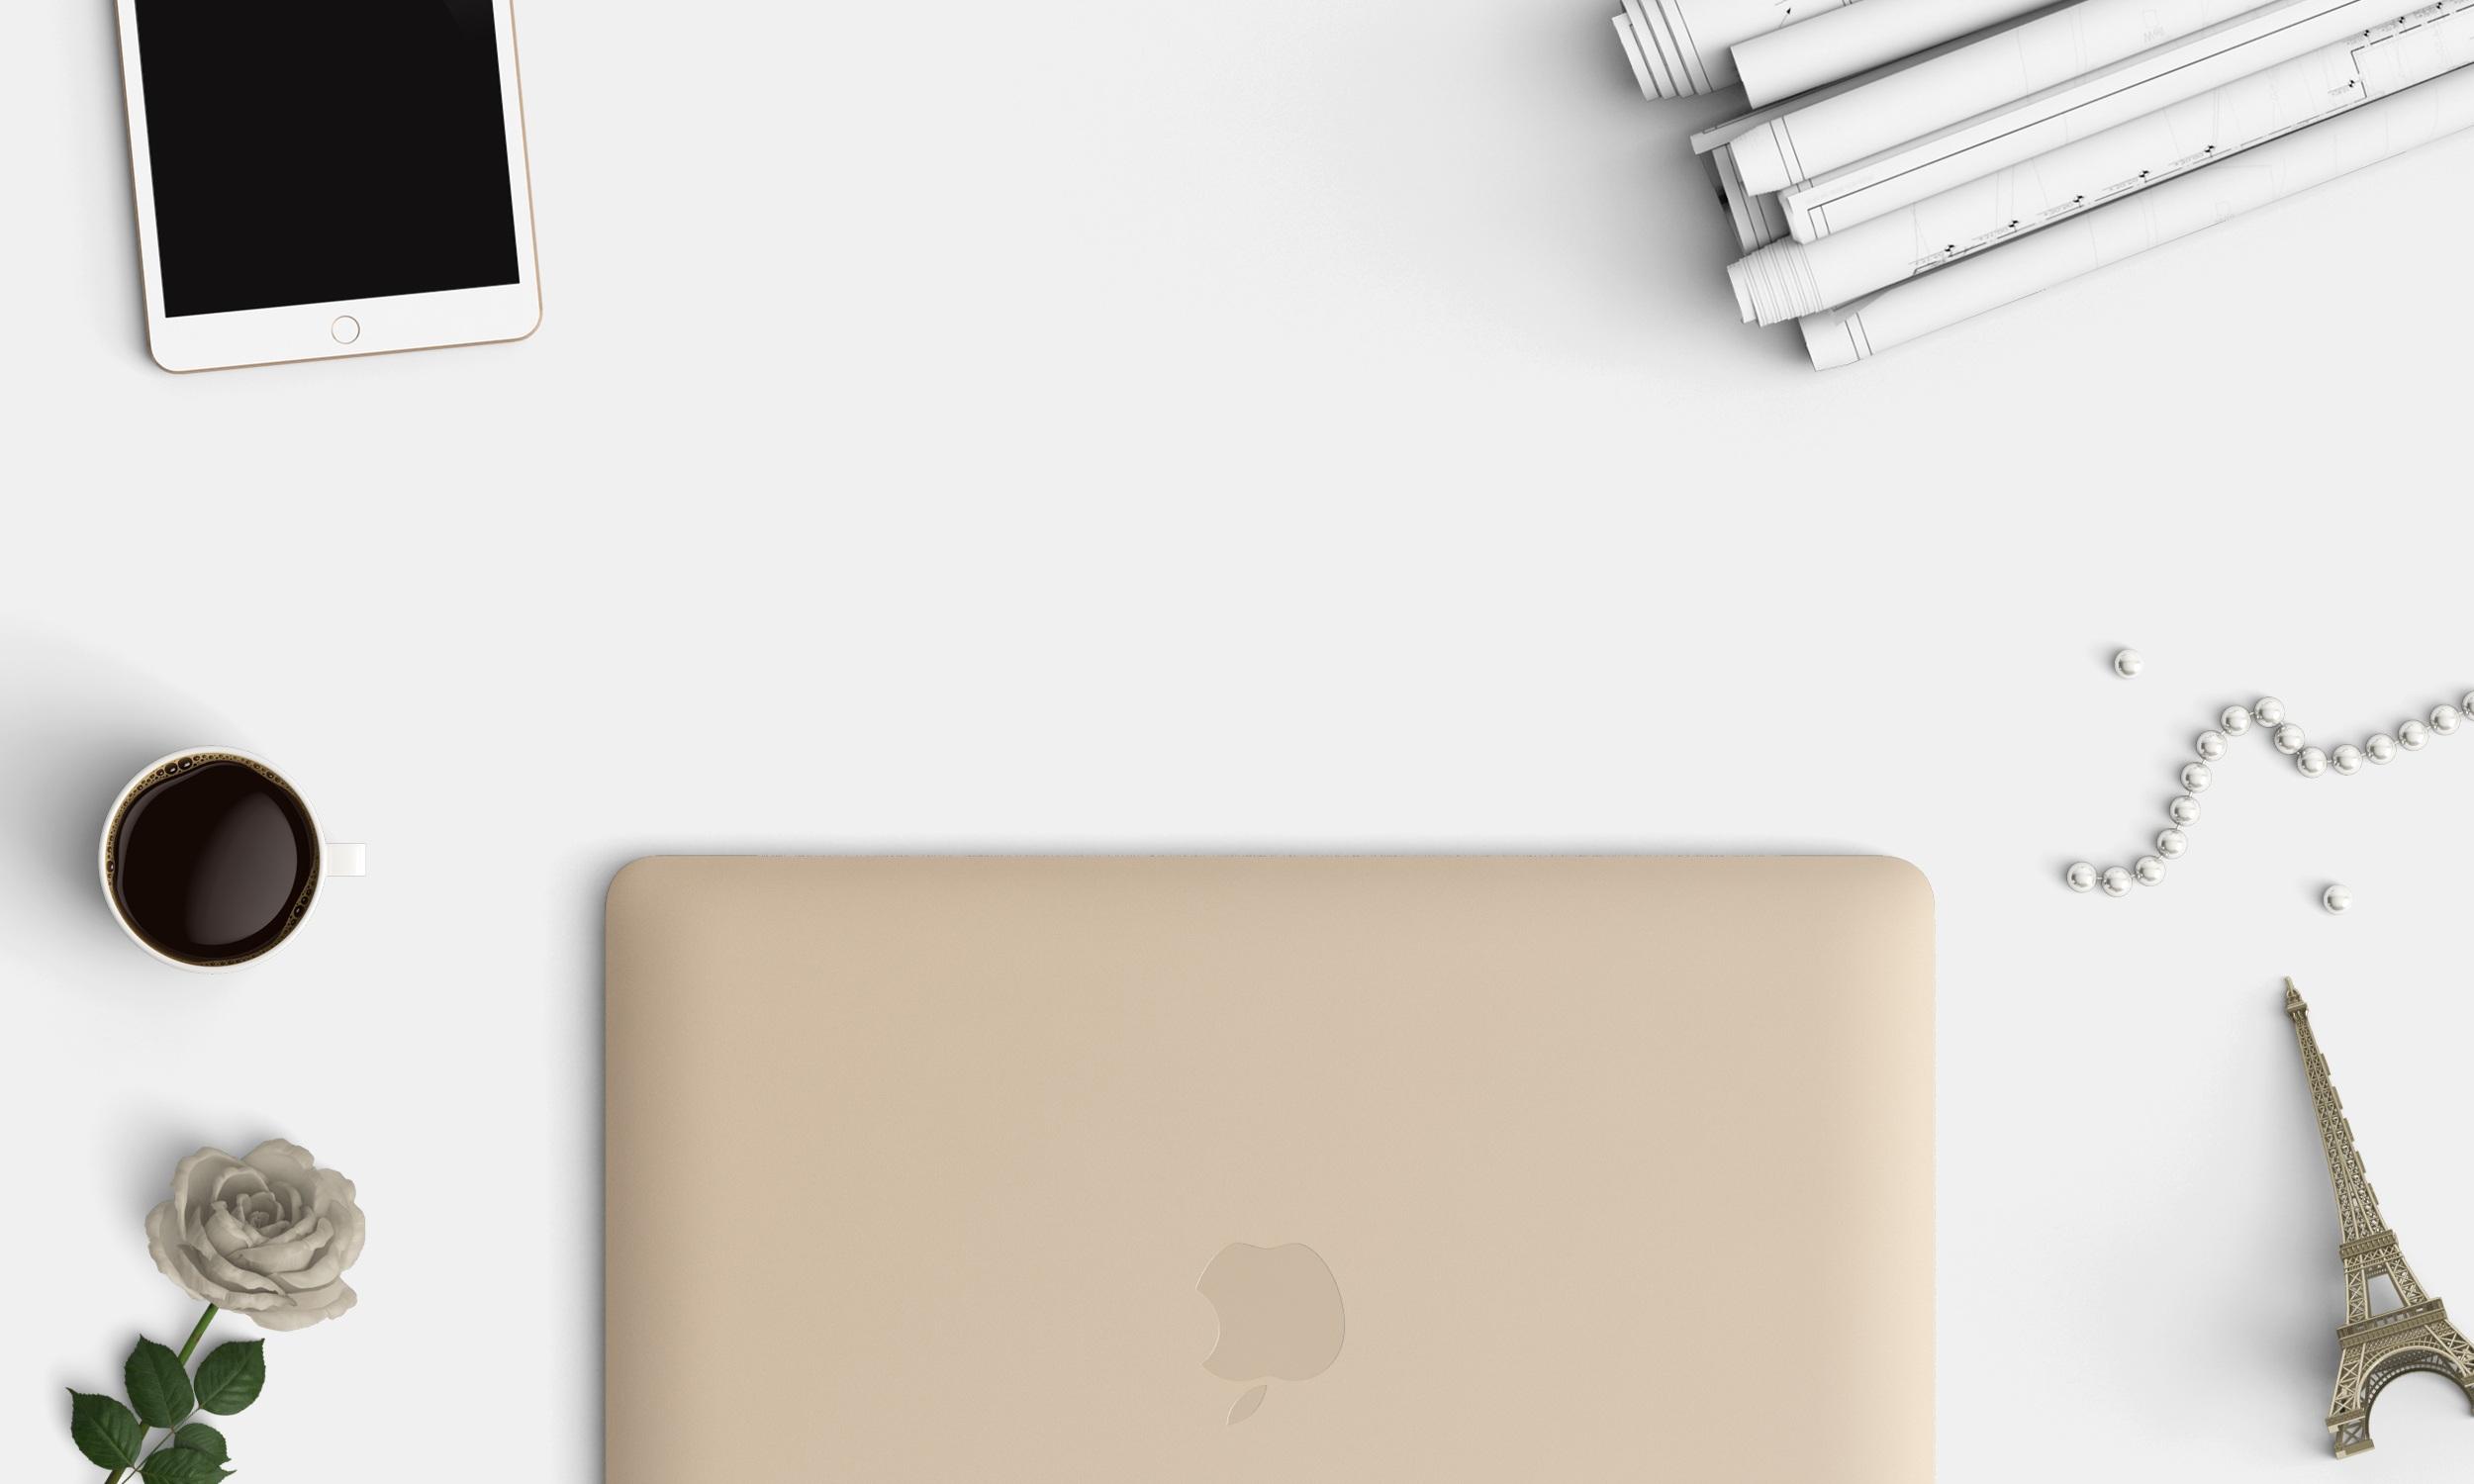 Apple Macbook, Apple, Electronic, Laptop, Mac, HQ Photo